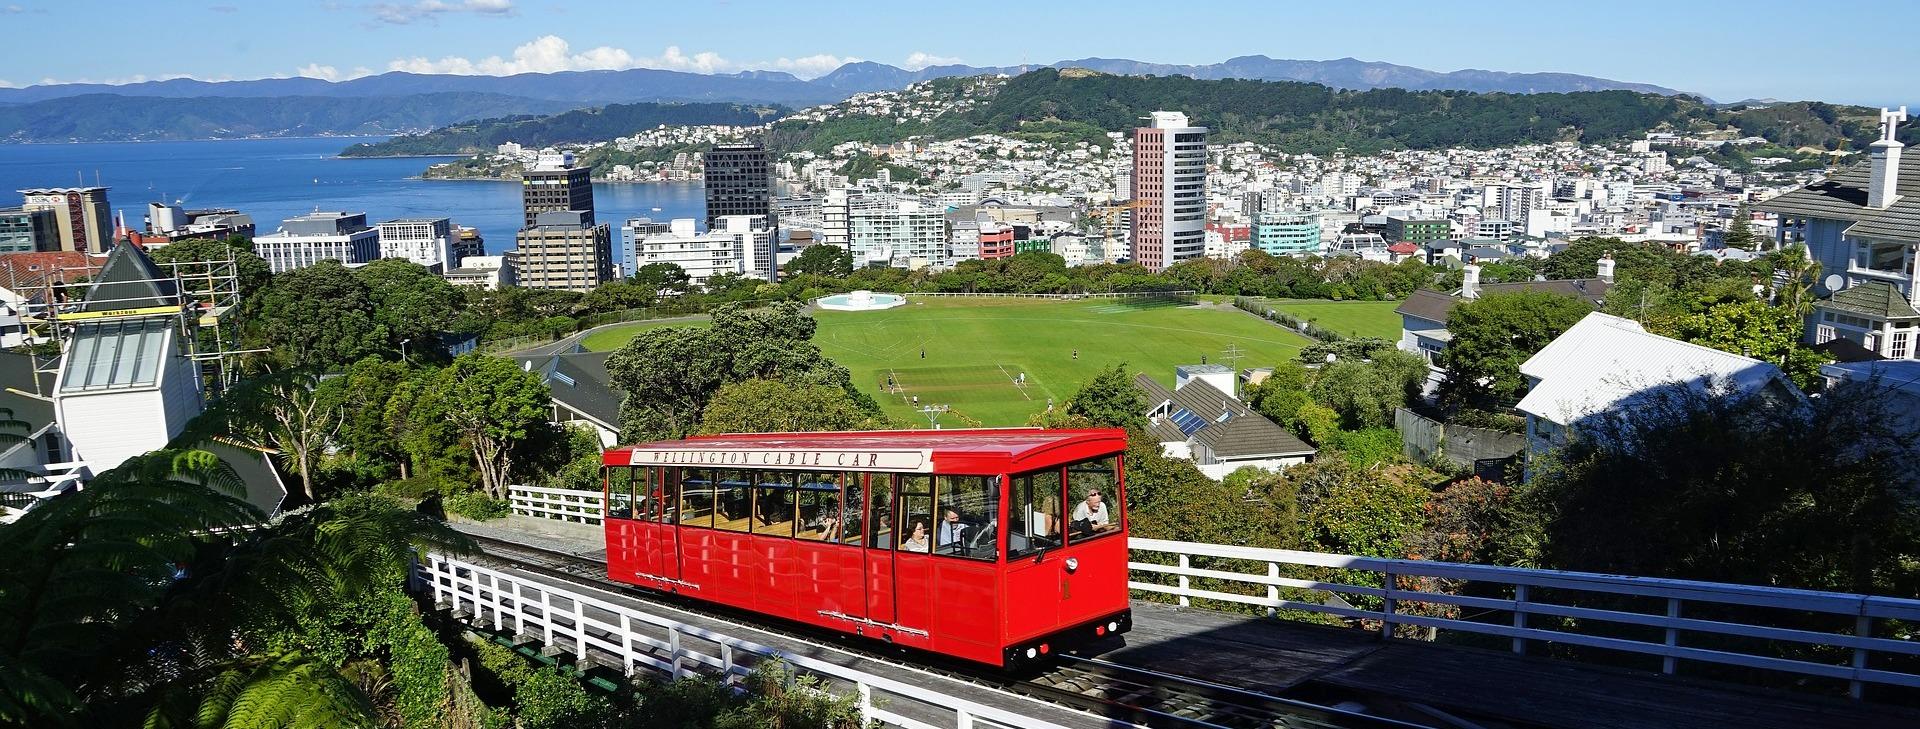 Autotransport Neuseeland Fahrzeugtransport